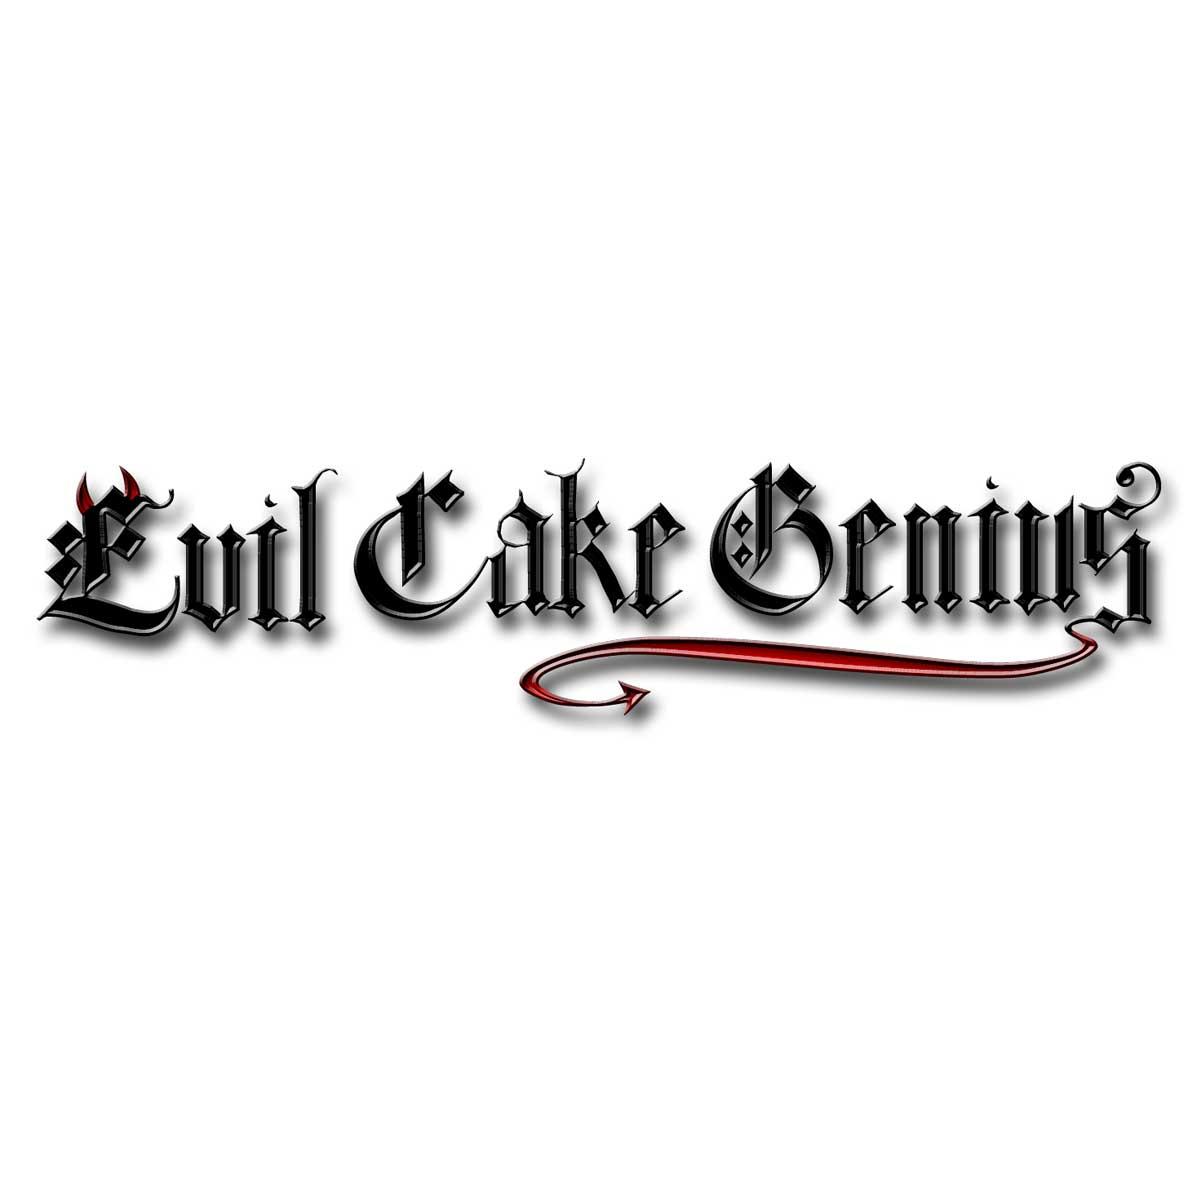 Crisp Corners Contour Combs for Double Barrel Cakes